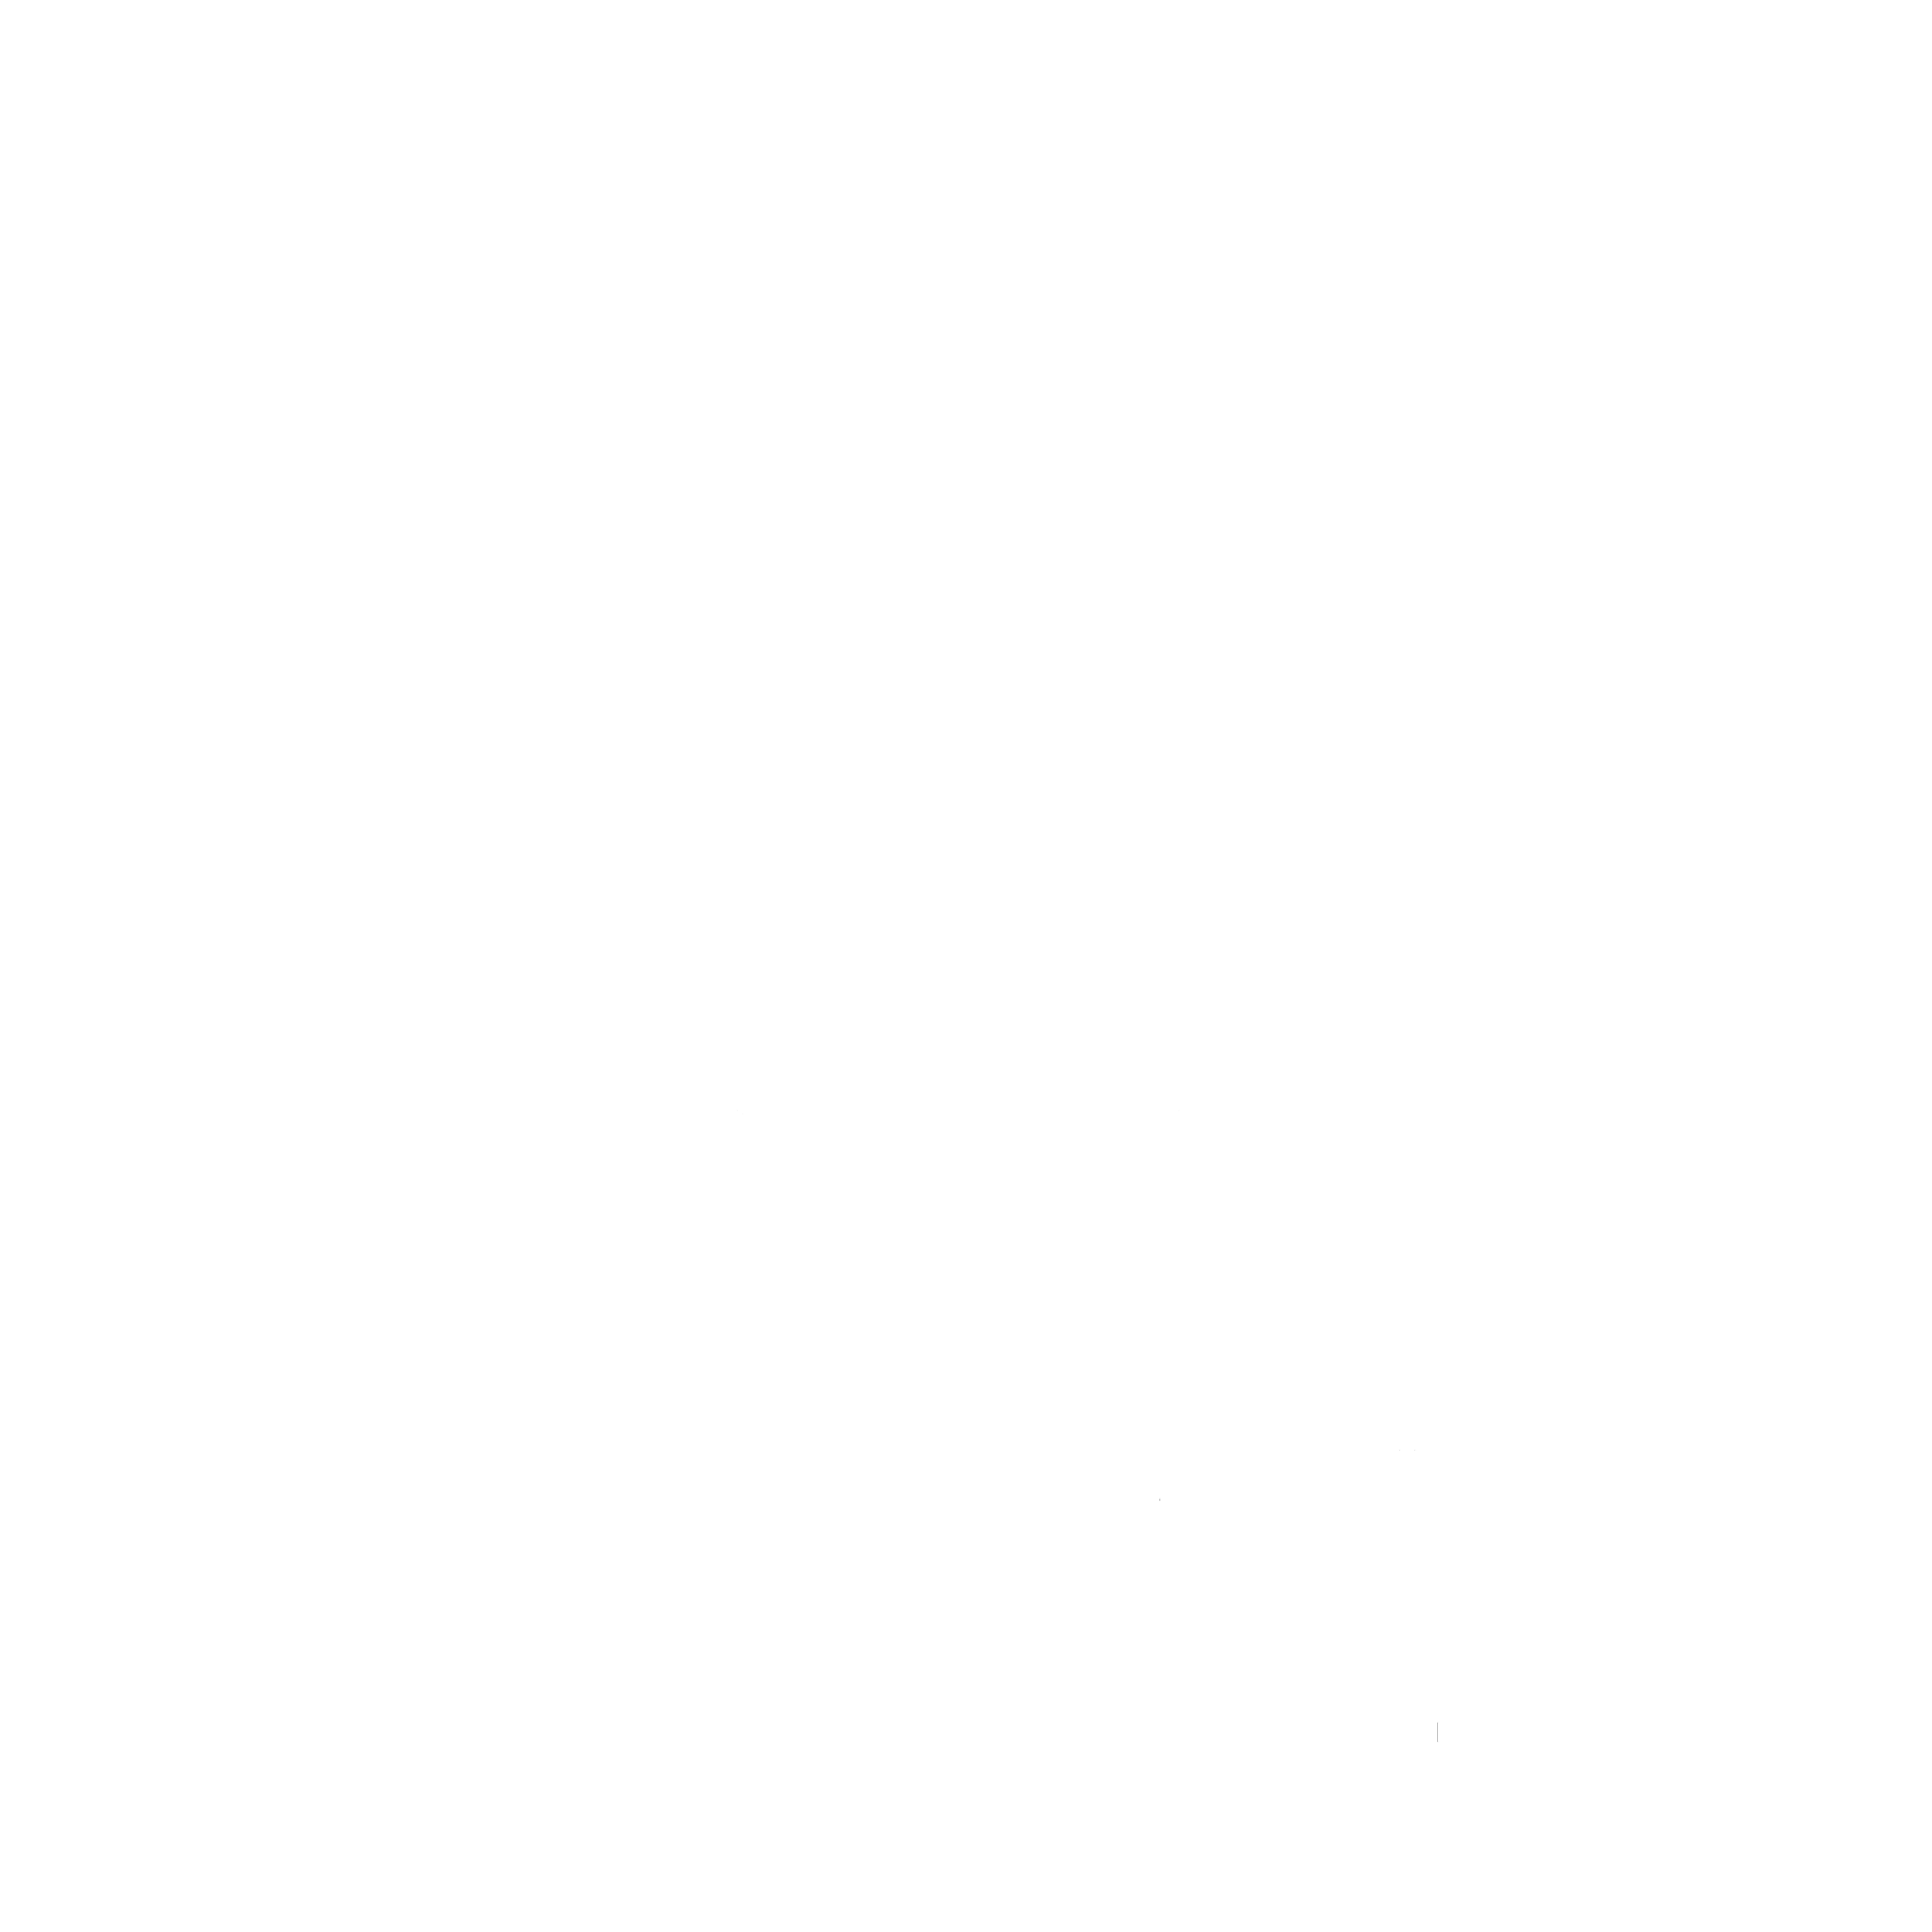 HARALDSON